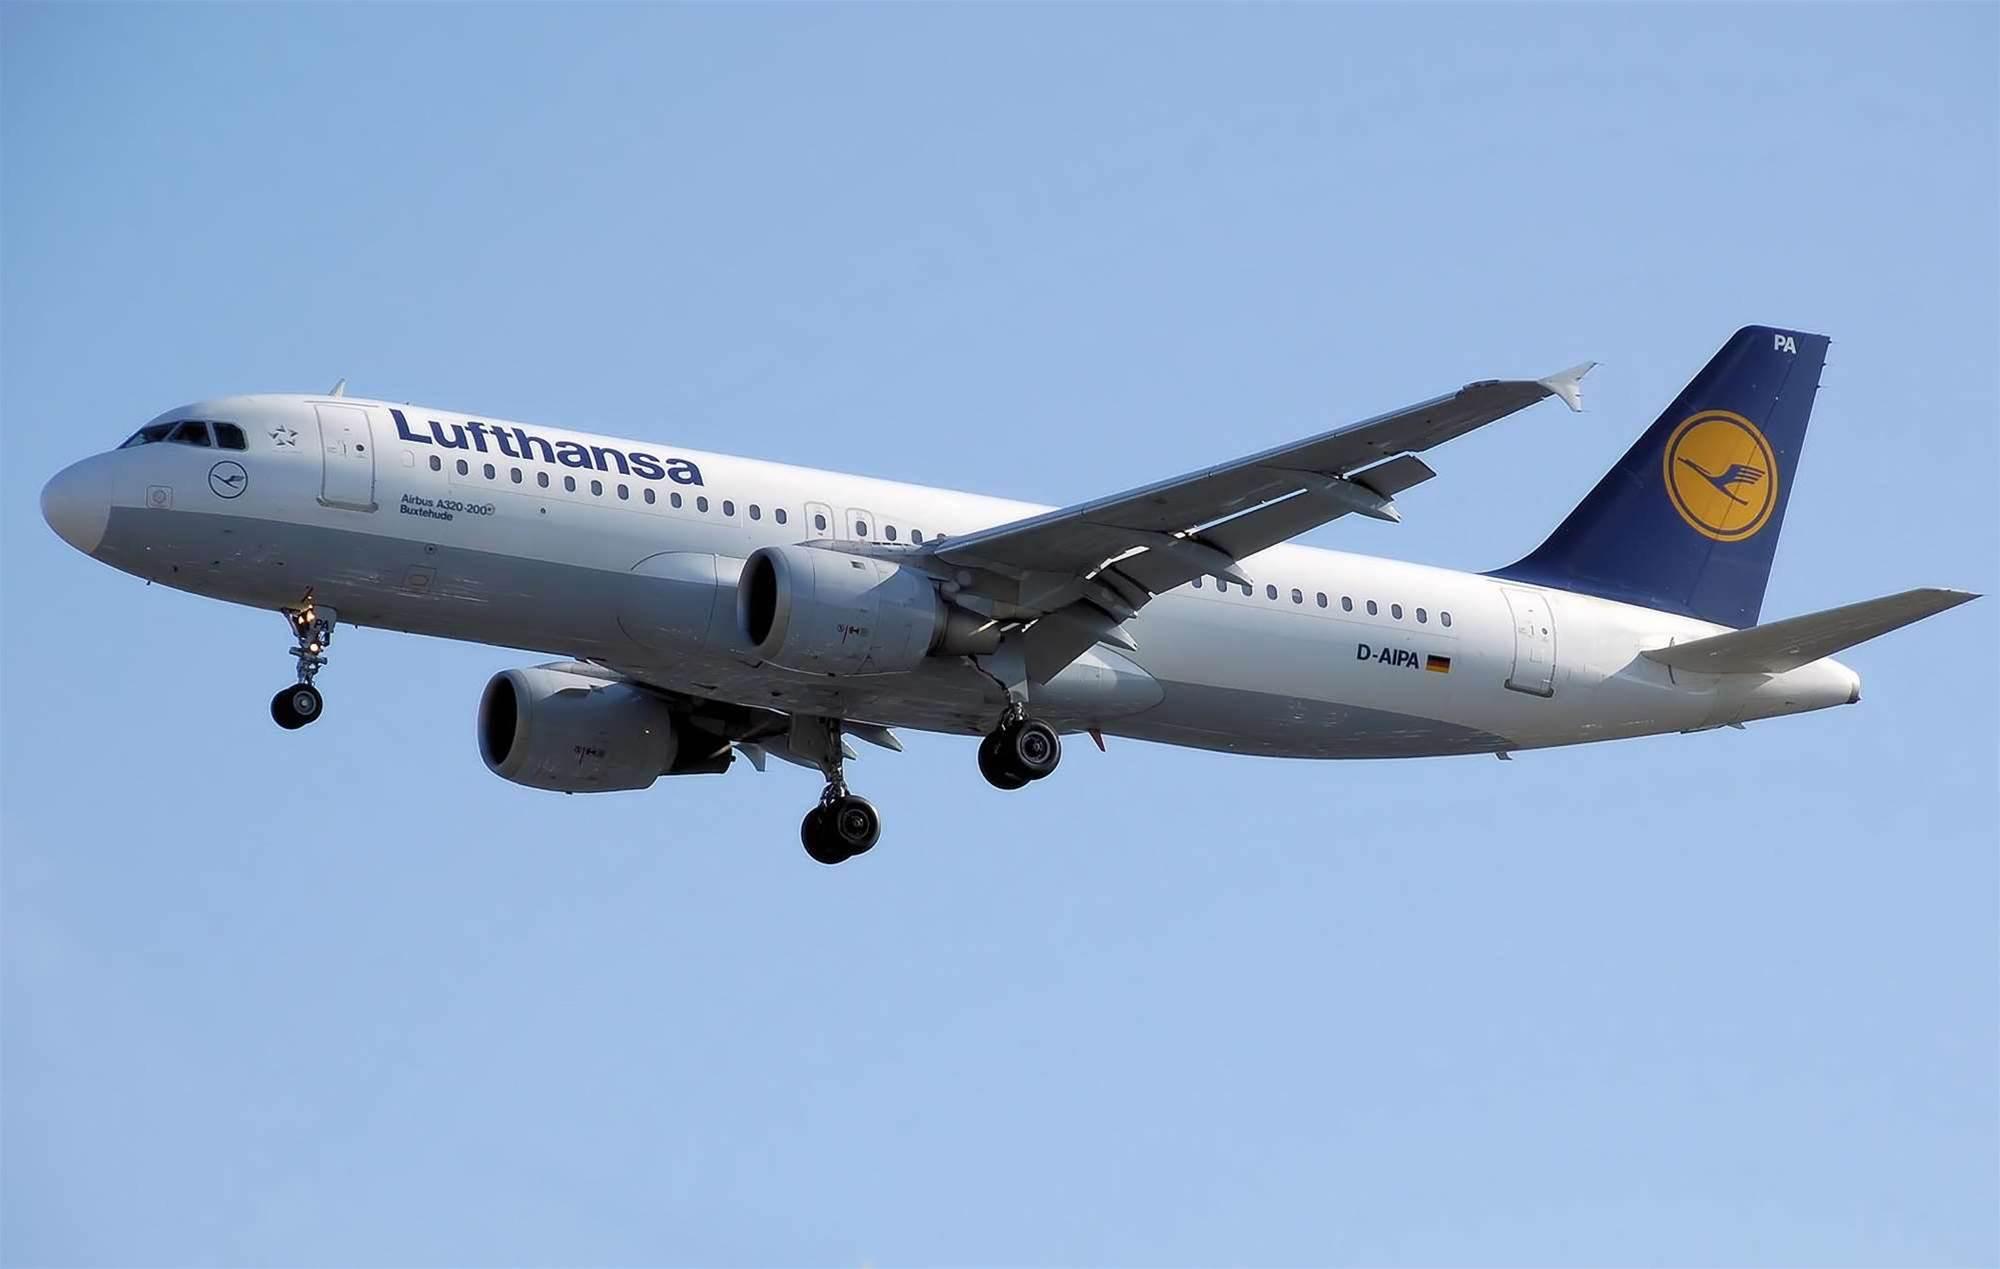 European travellers to get high-speed, in-flight internet